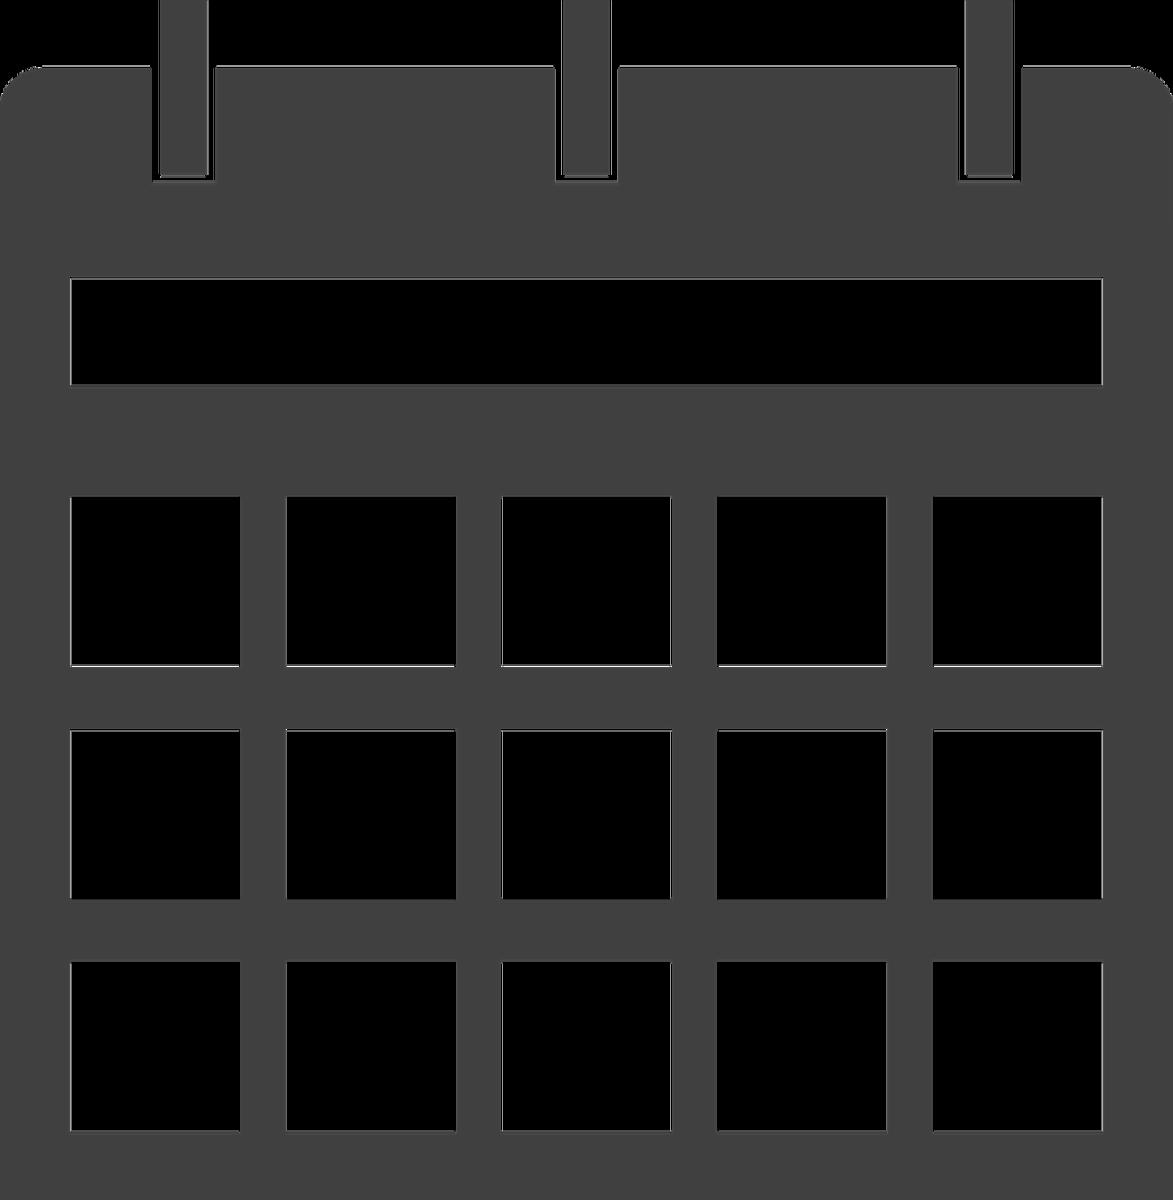 Calendar Thumbnail, Link to XC Schedule